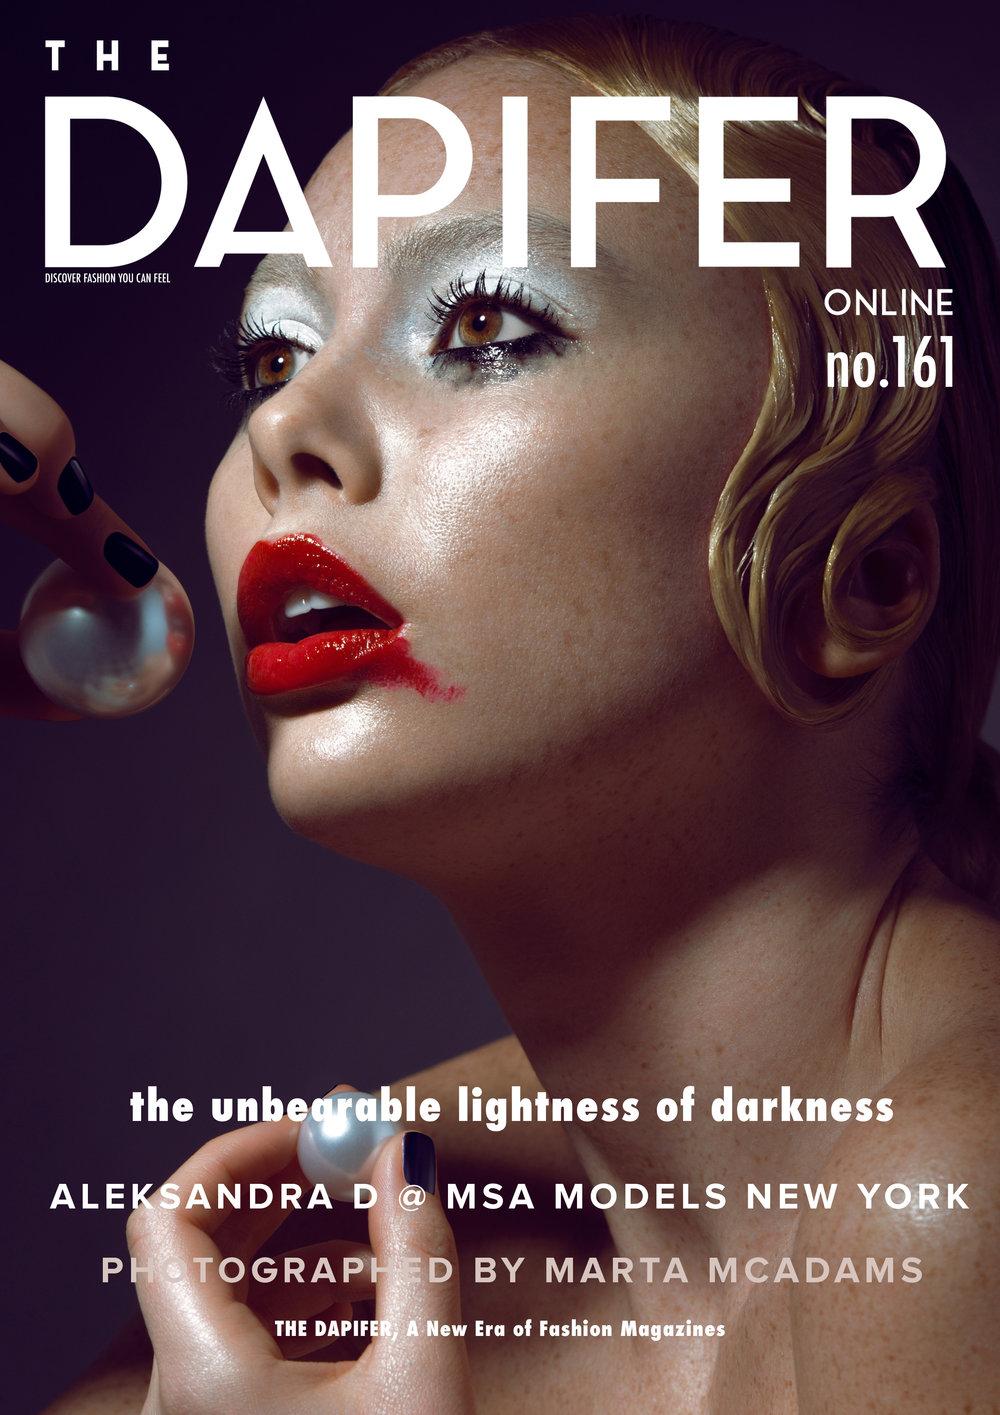 Aleksandra D by Marta McAdams Beauty Editorial - The Dapifer.jpg